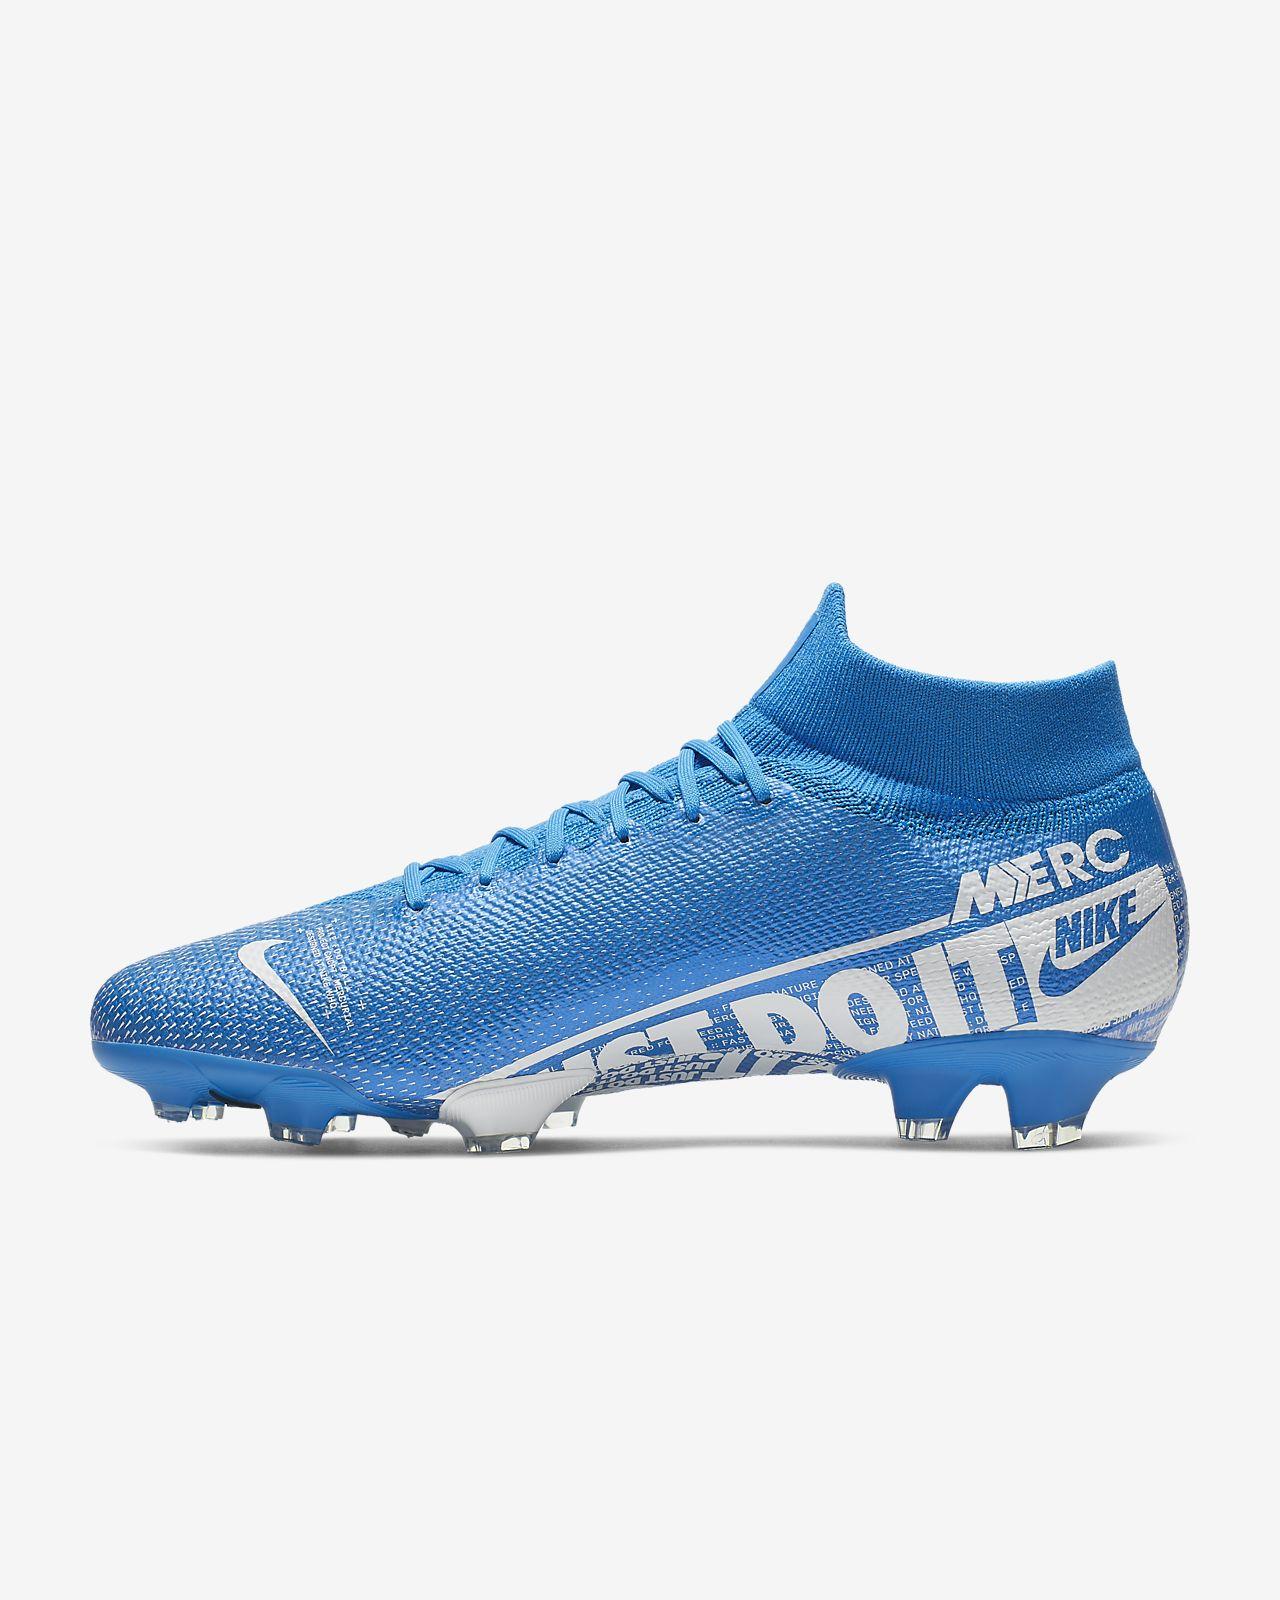 Nike Mercurial Superfly 7 Pro FG Botas de fútbol para terreno firme